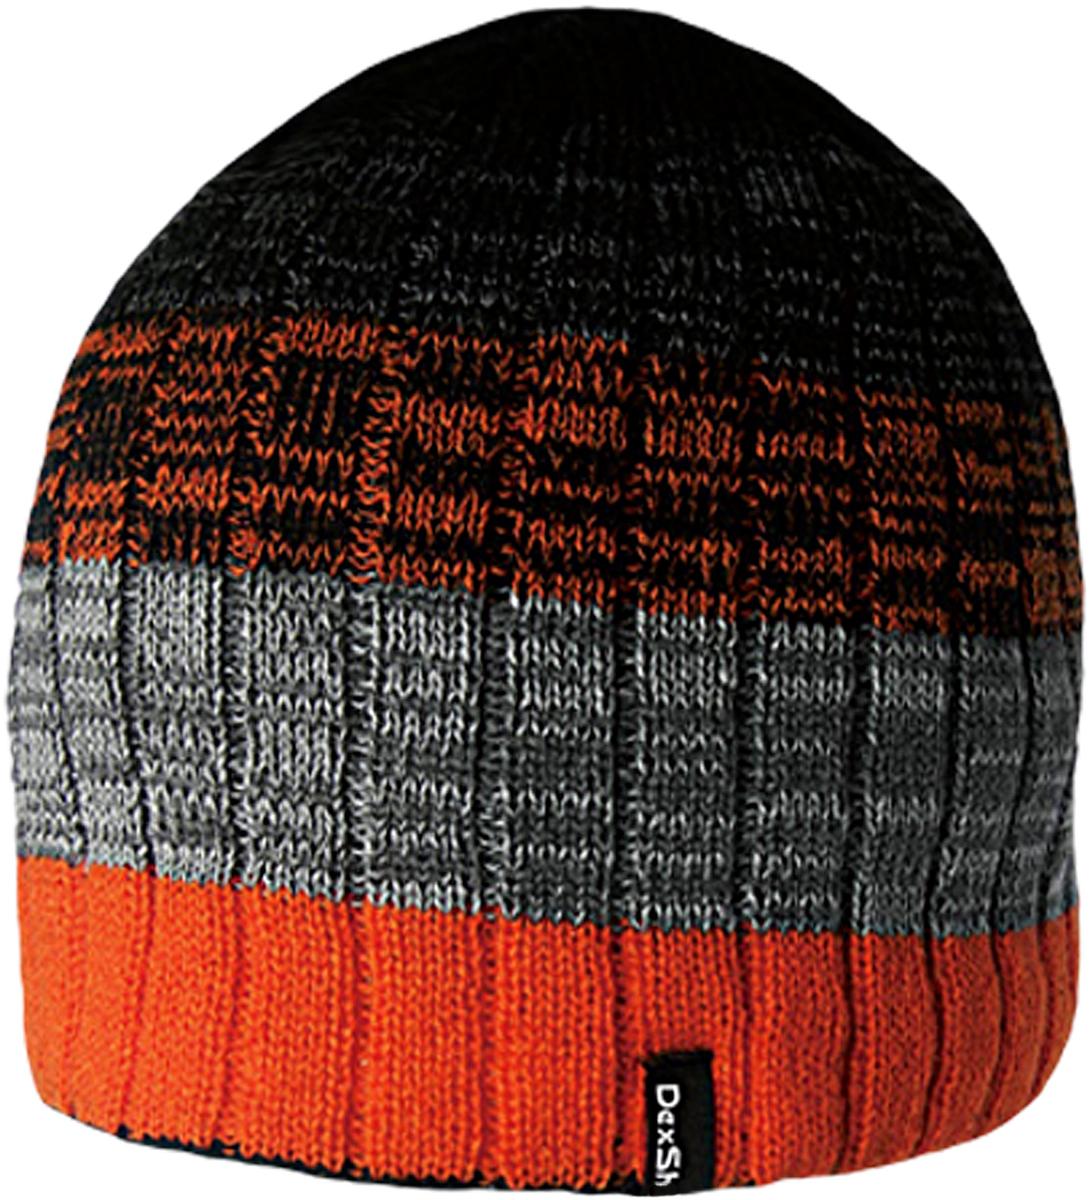 Шапка водонепроницаемая Dexshell, цвет: оранжевый. DH332N. Размер универсальный